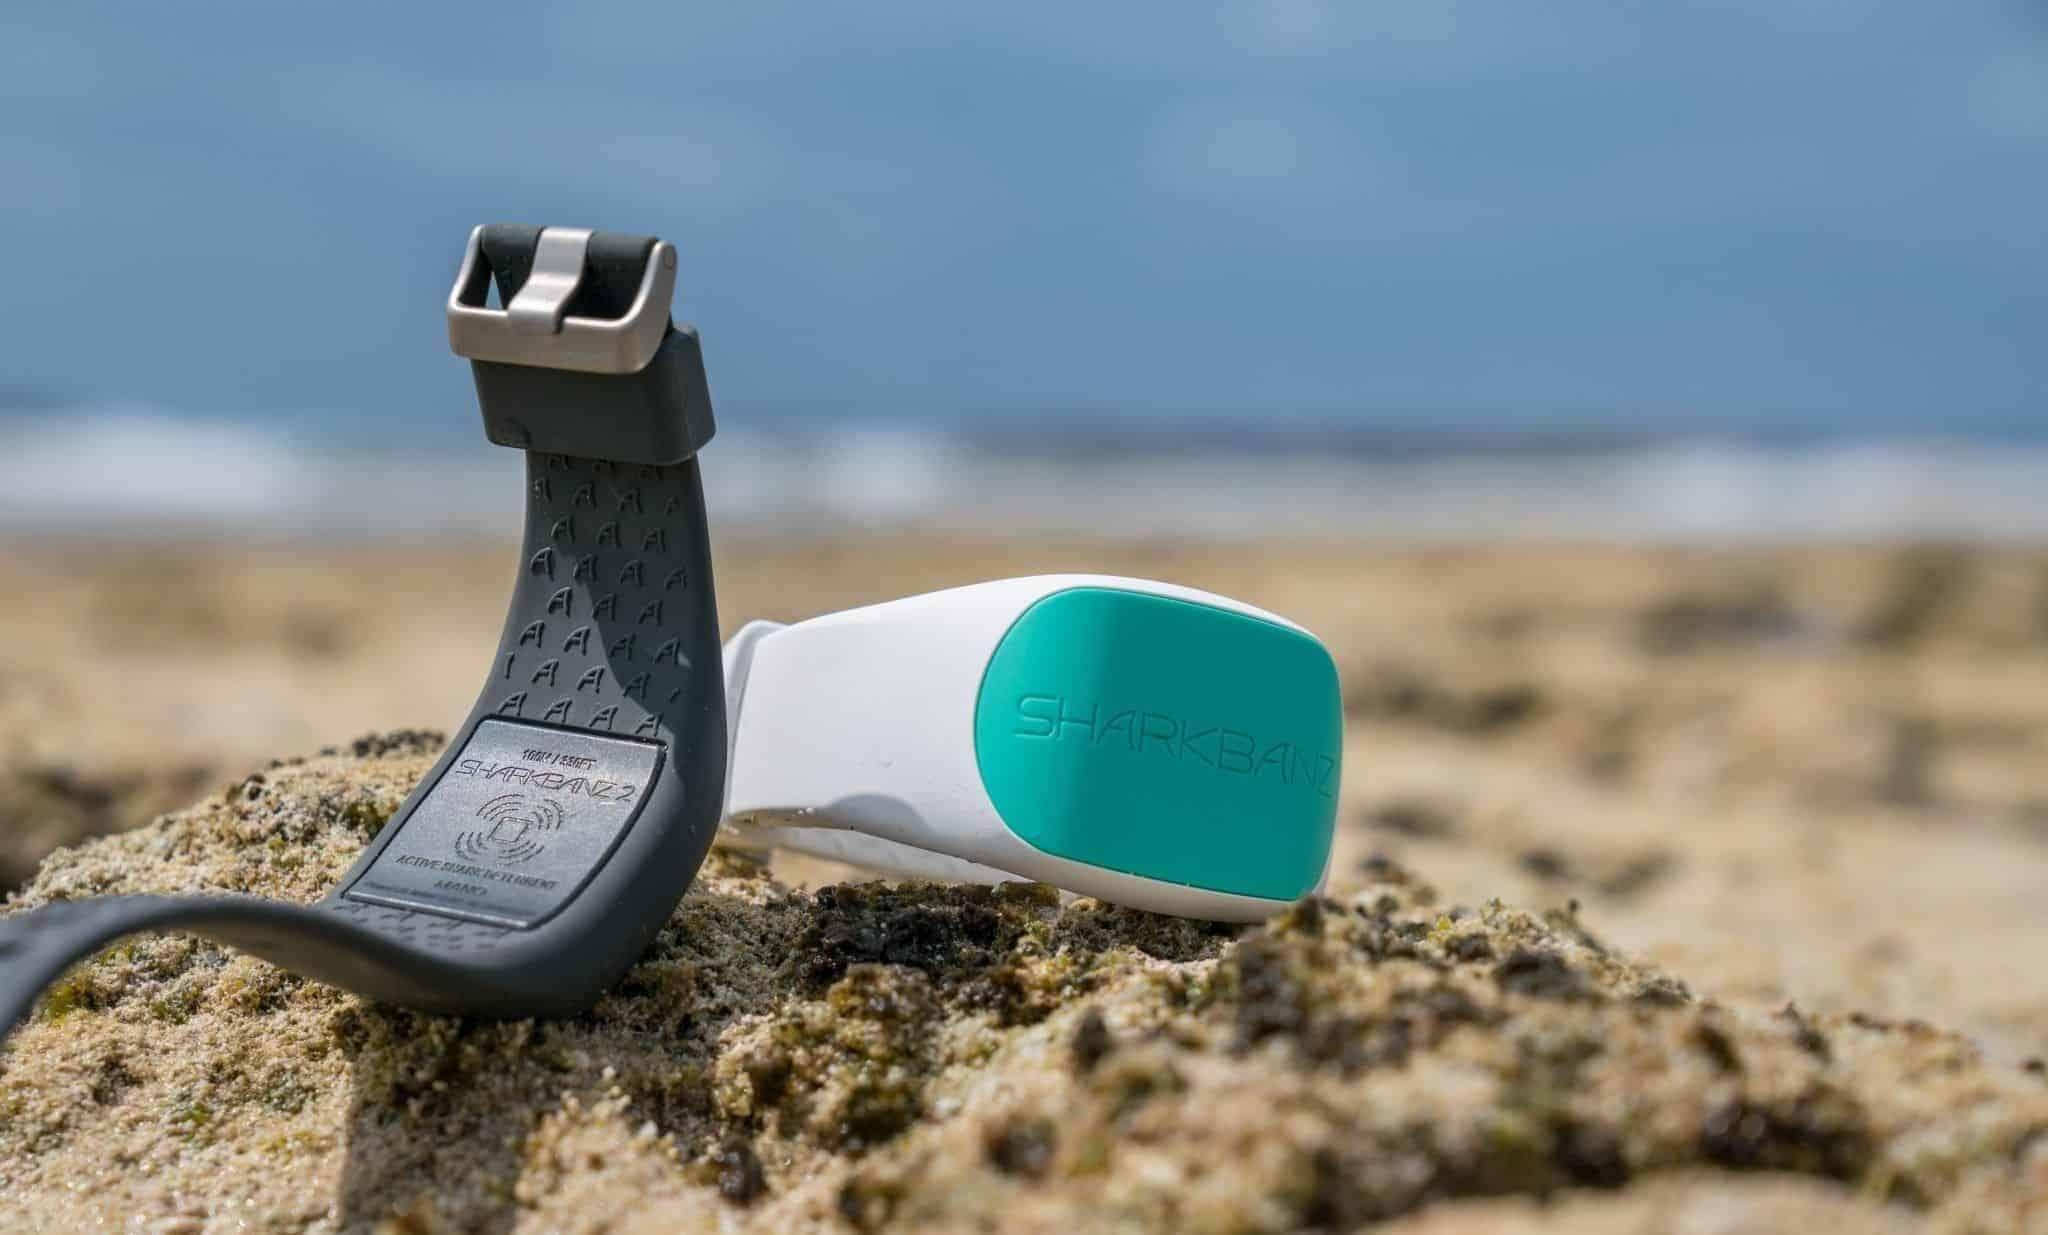 Sharkbanz 2 Magnetic Shark Repellent